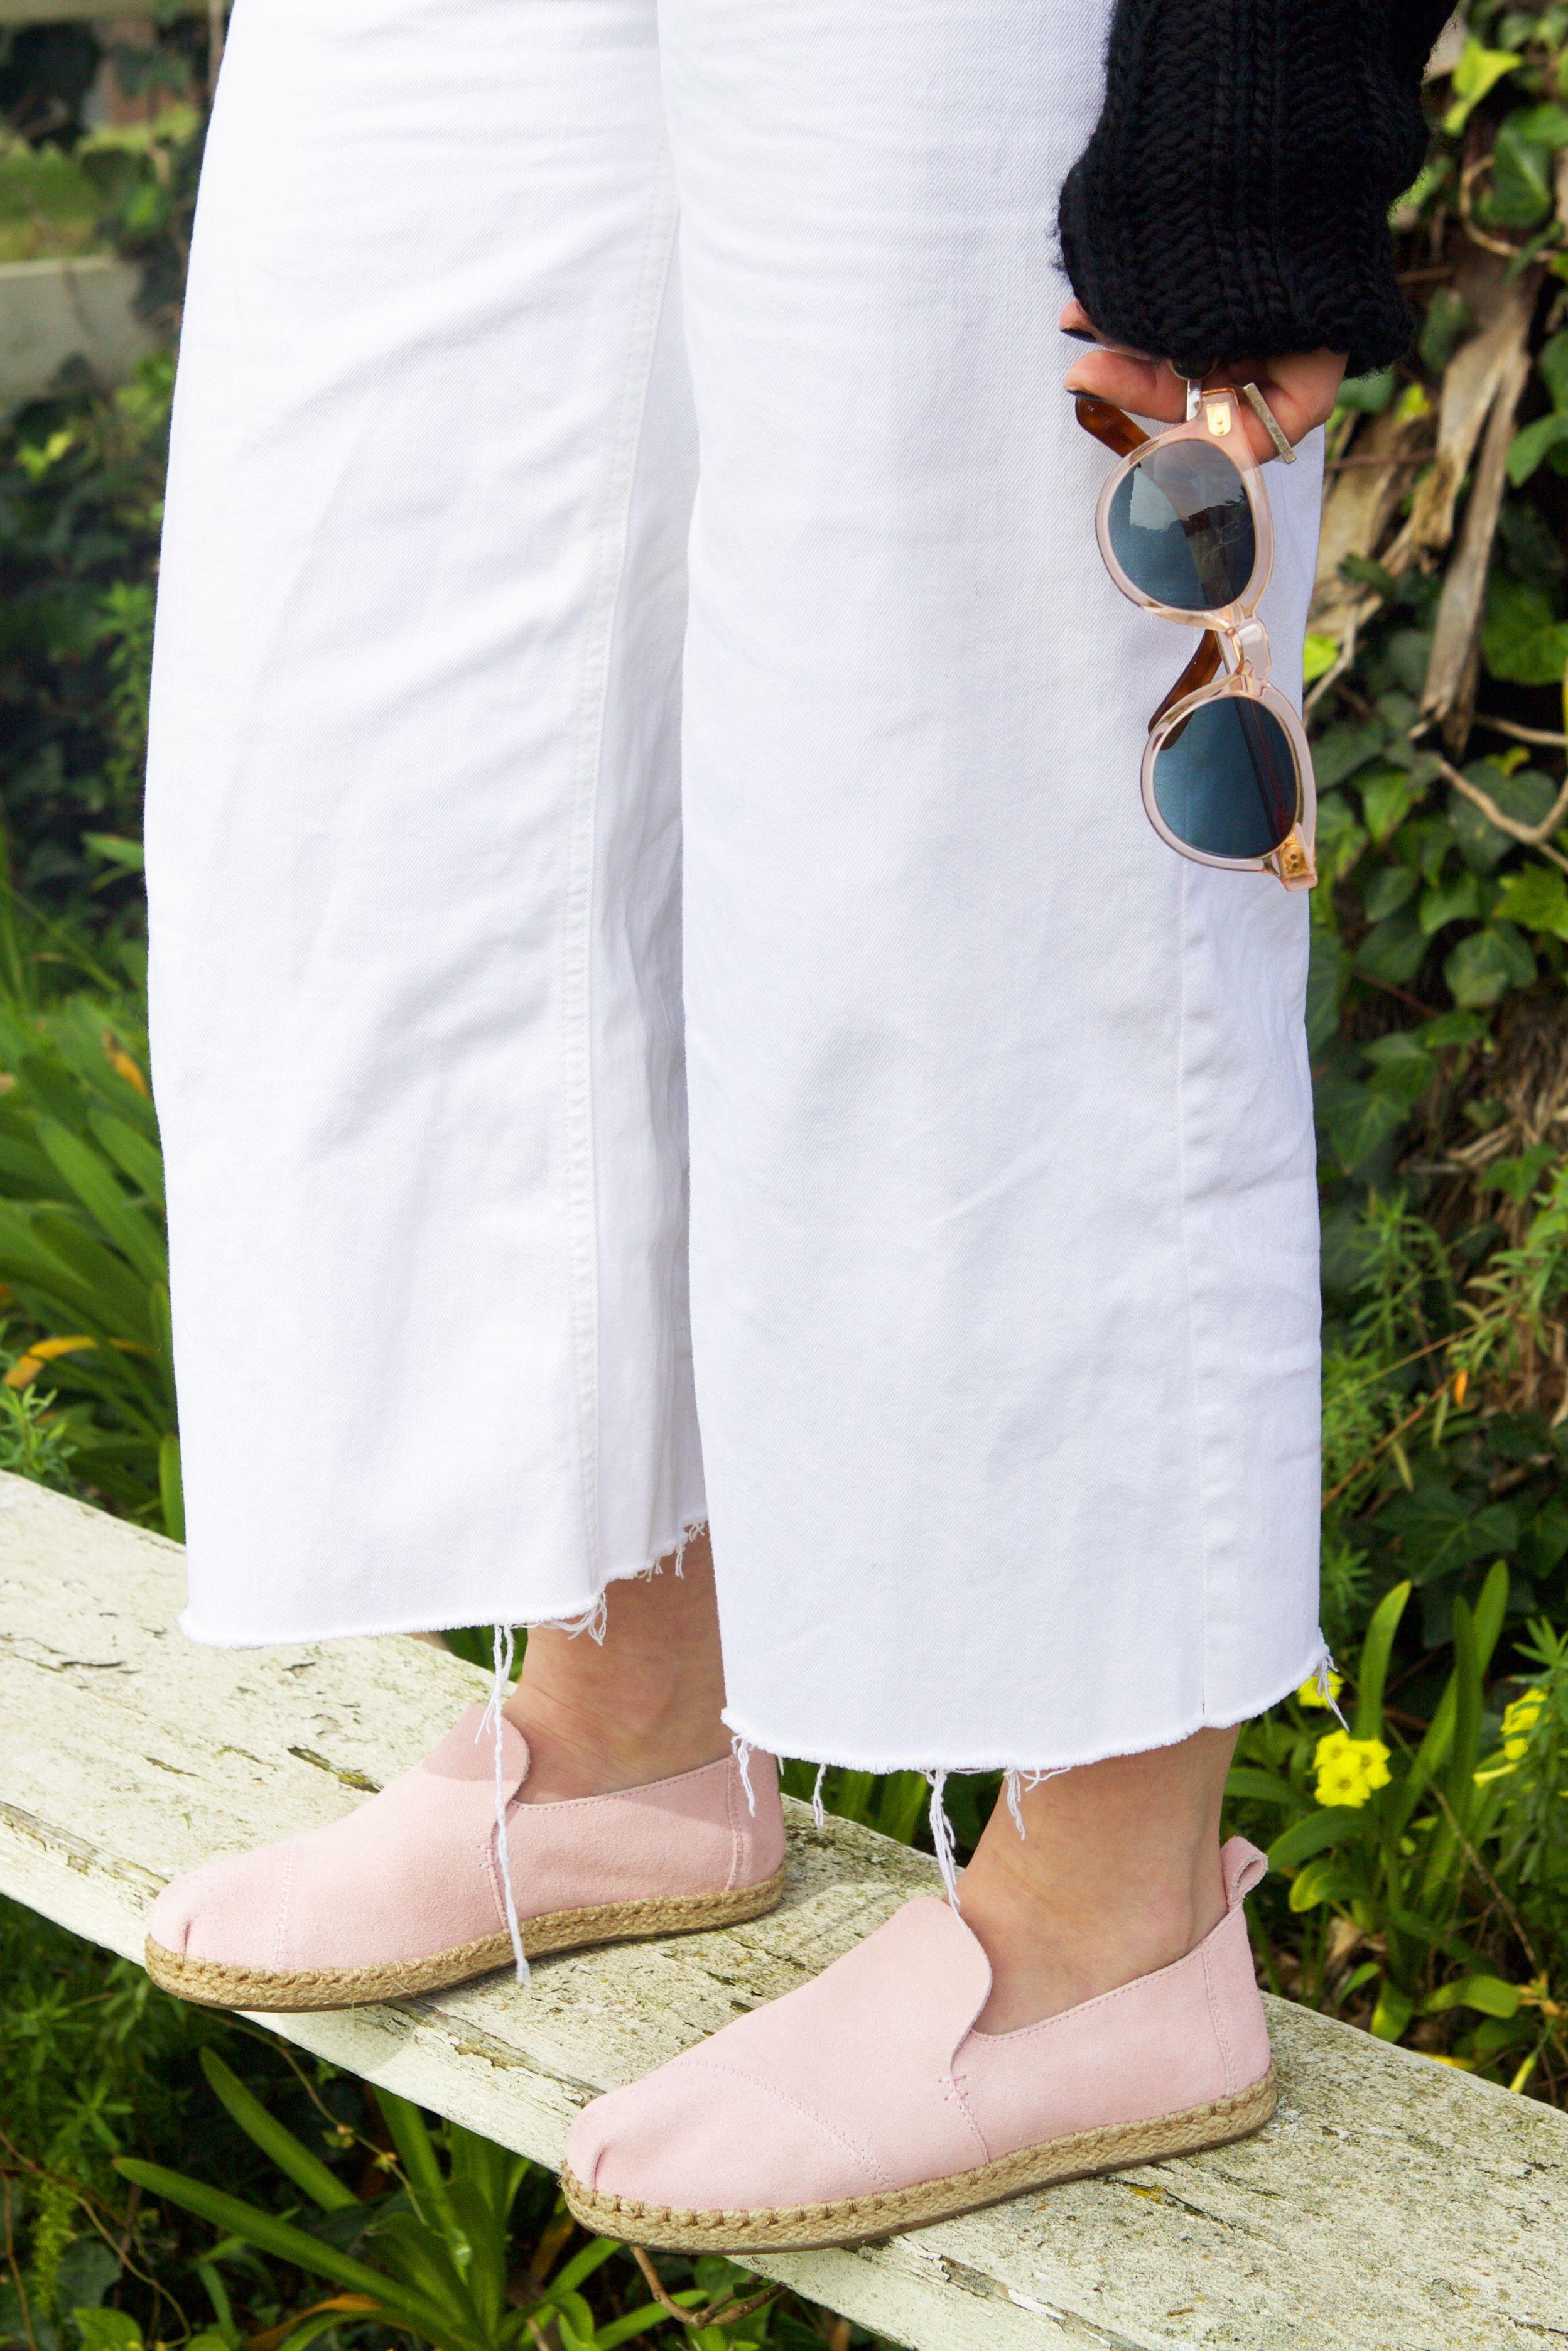 Women's sandals with removable insoles - Pale Pink Suede Women S Deconstructed Alpargatas